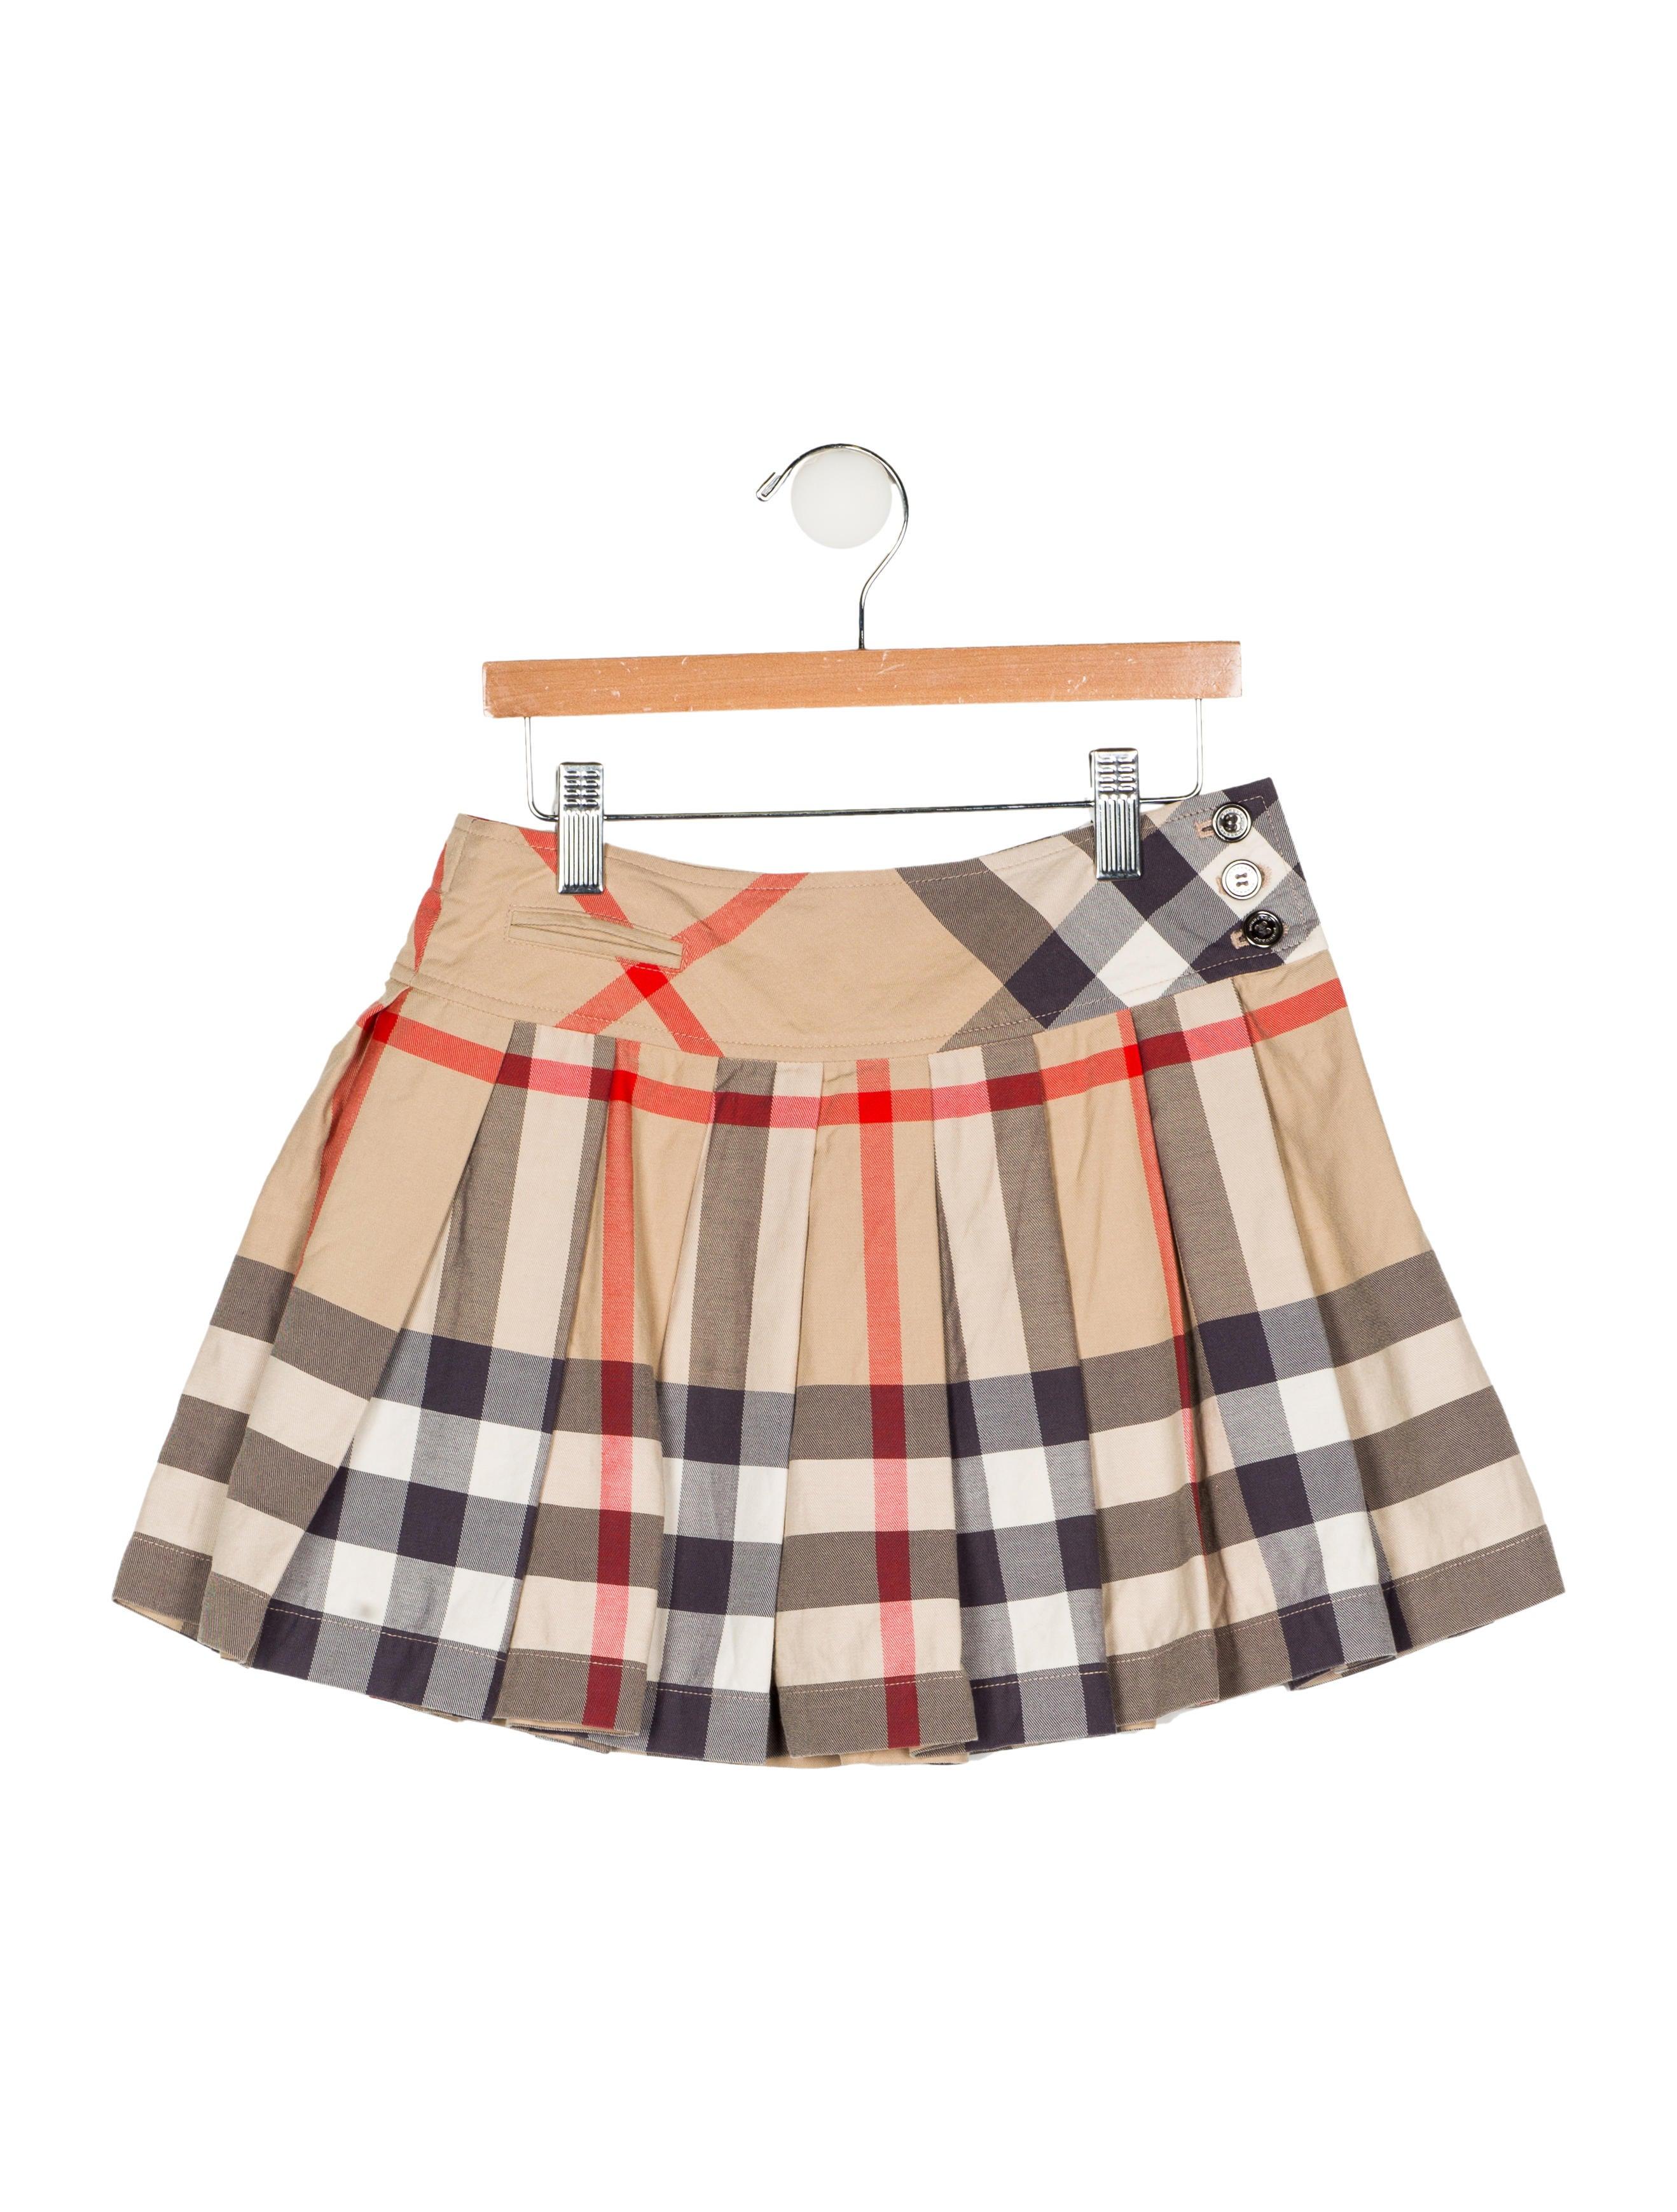 7c31c092c3 Burberry Girls' Pleated Nova Check Skirt - Girls - BUR105049   The ...